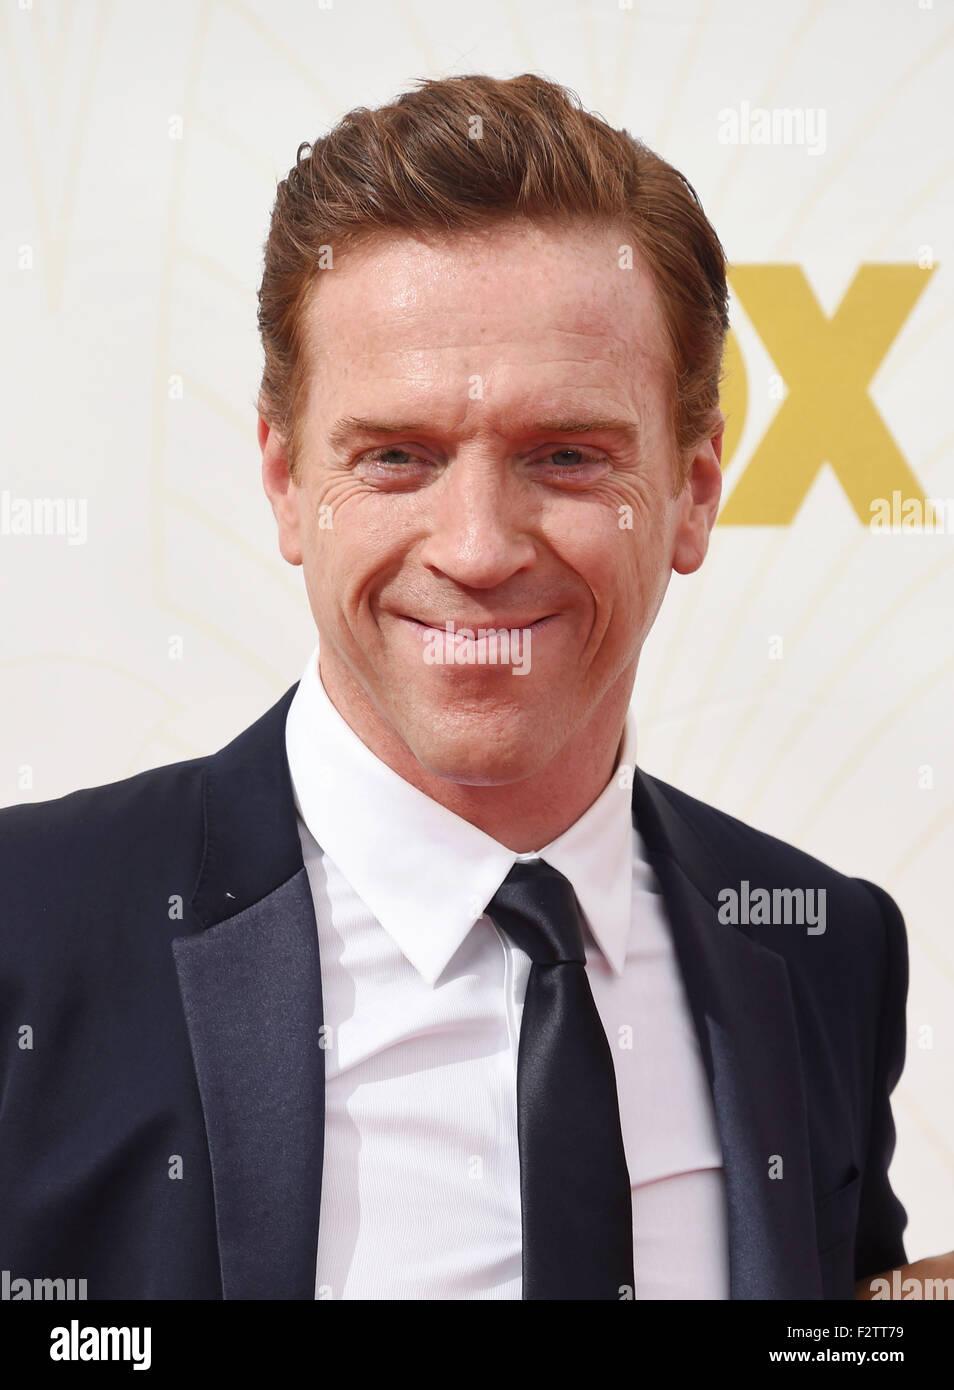 DAMIAN LEWIS  English film actor in September 2015. Photo Jeffrey Mayer Stock Photo